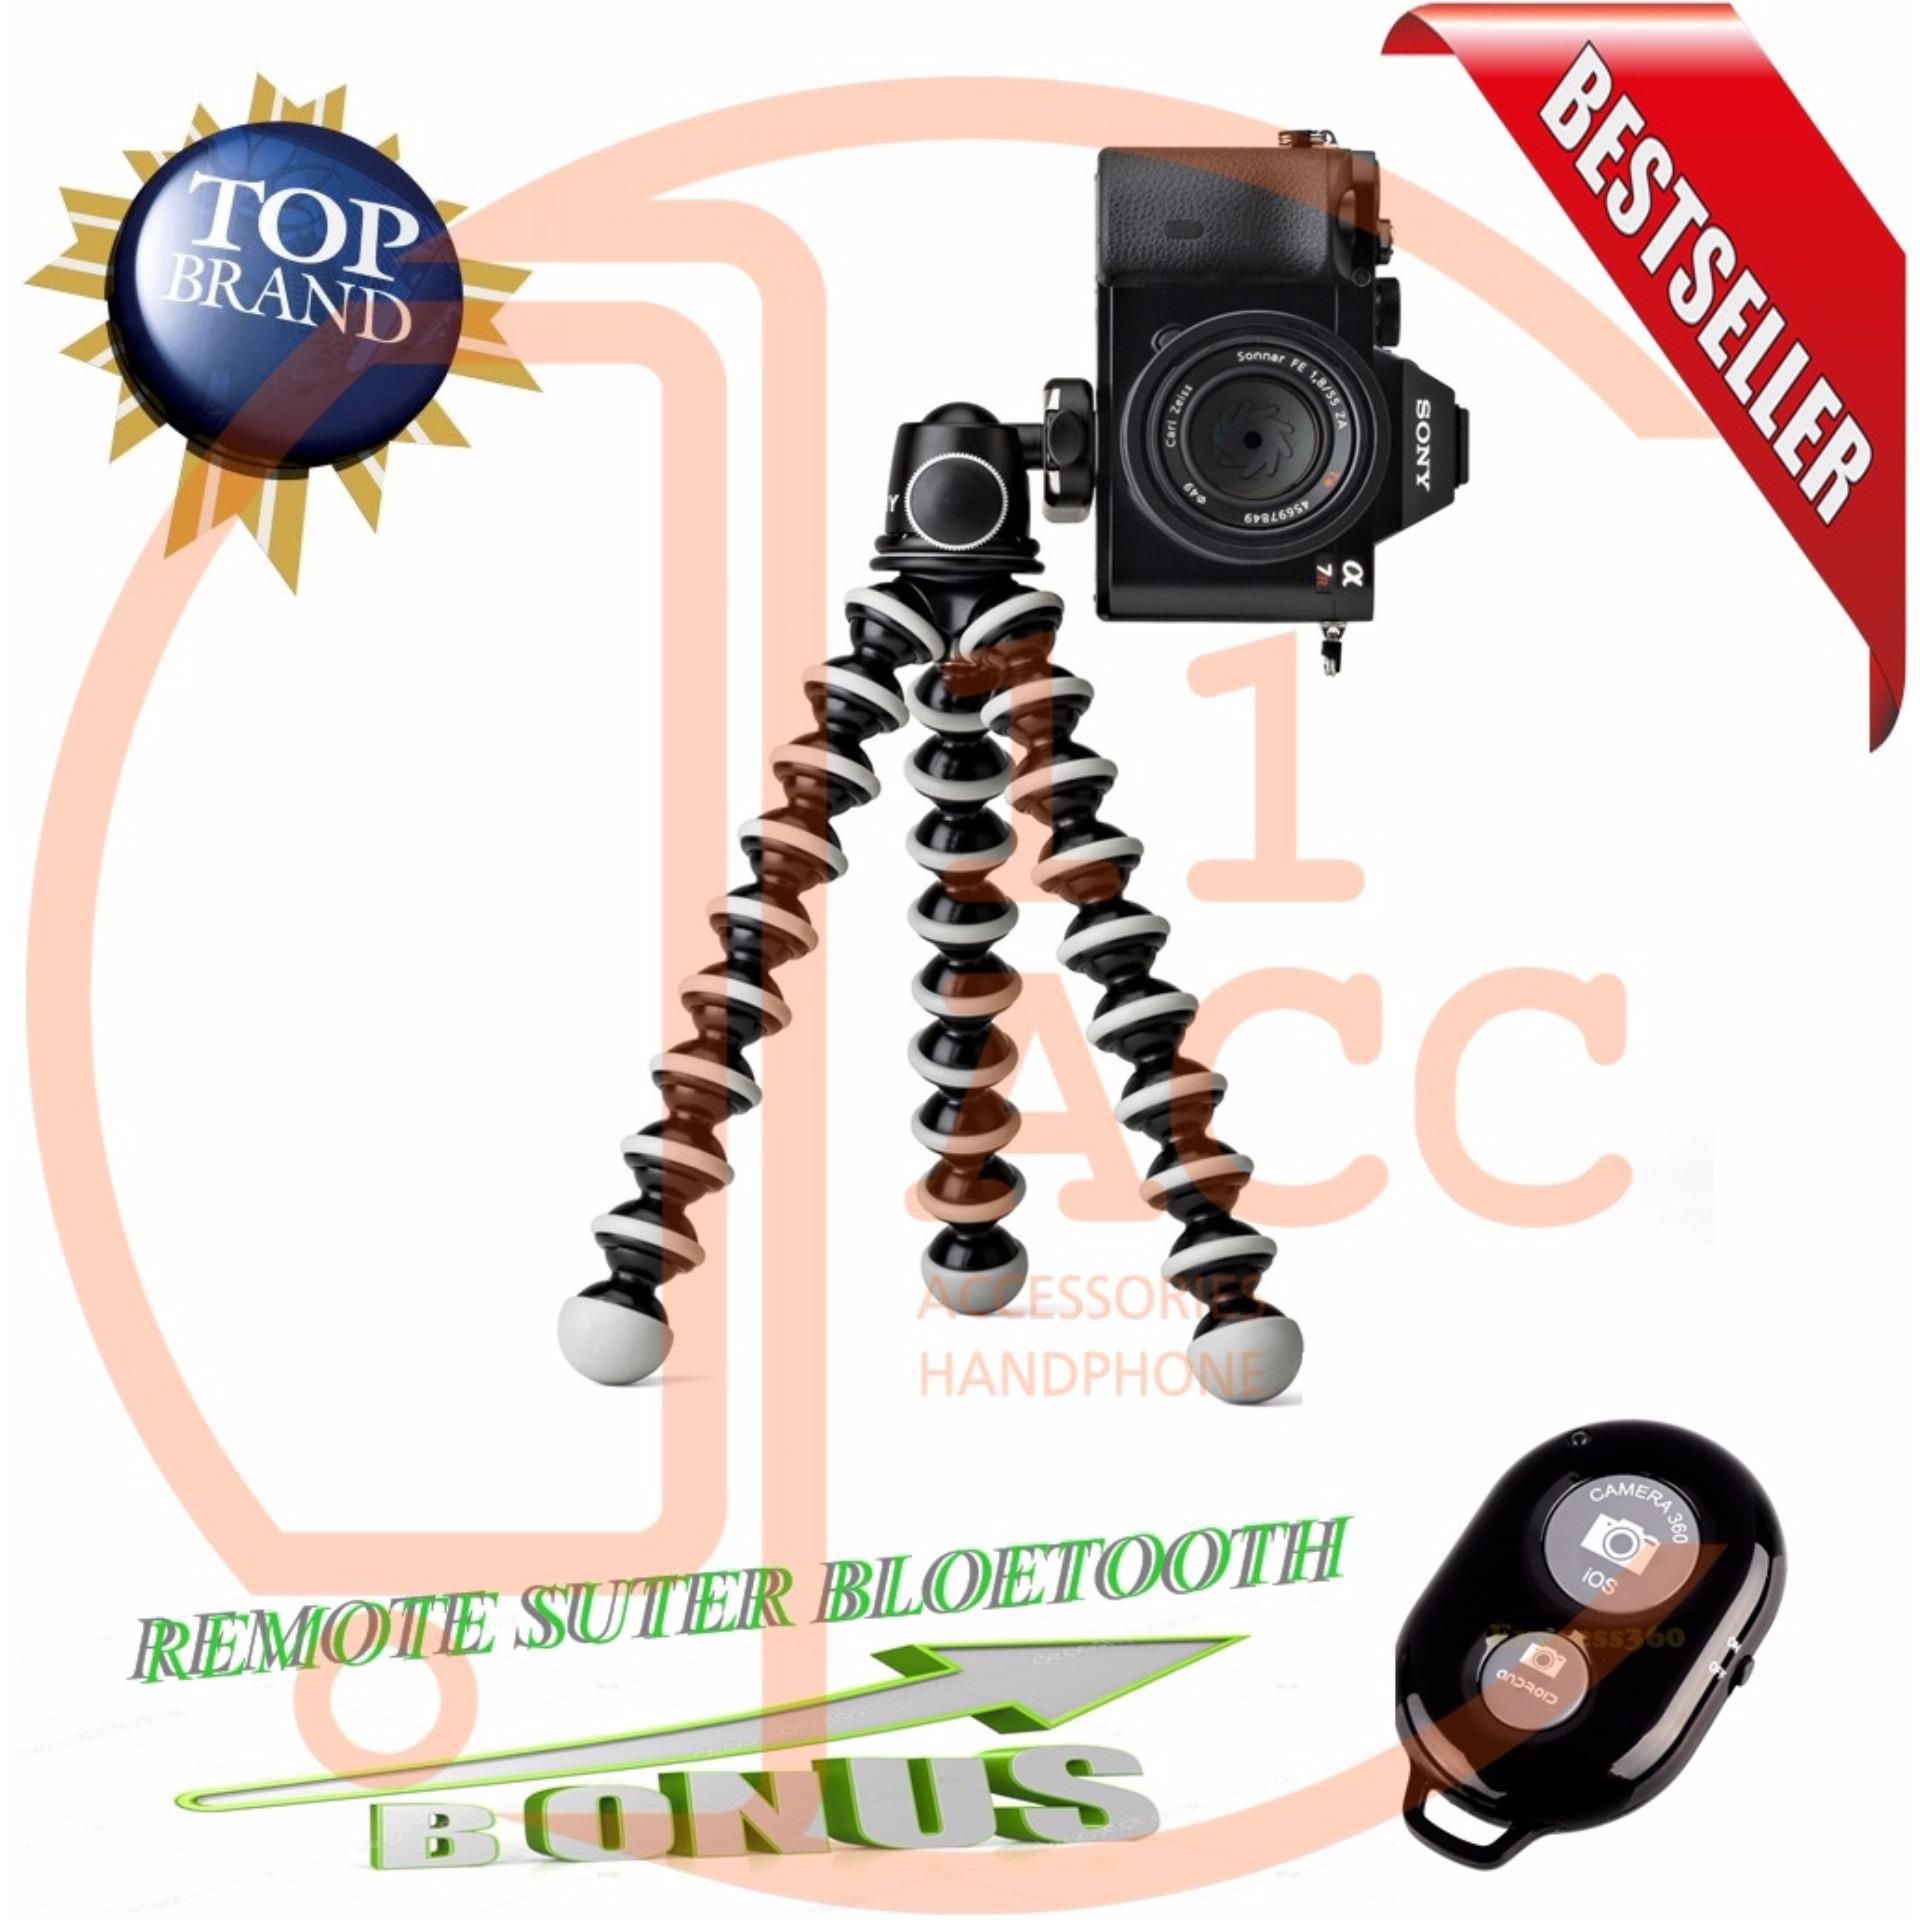 ... Mini Tripod Flexible Tripod Gorilla Pod Octopus + Holder U Free Remote Shutter bluetooth ...